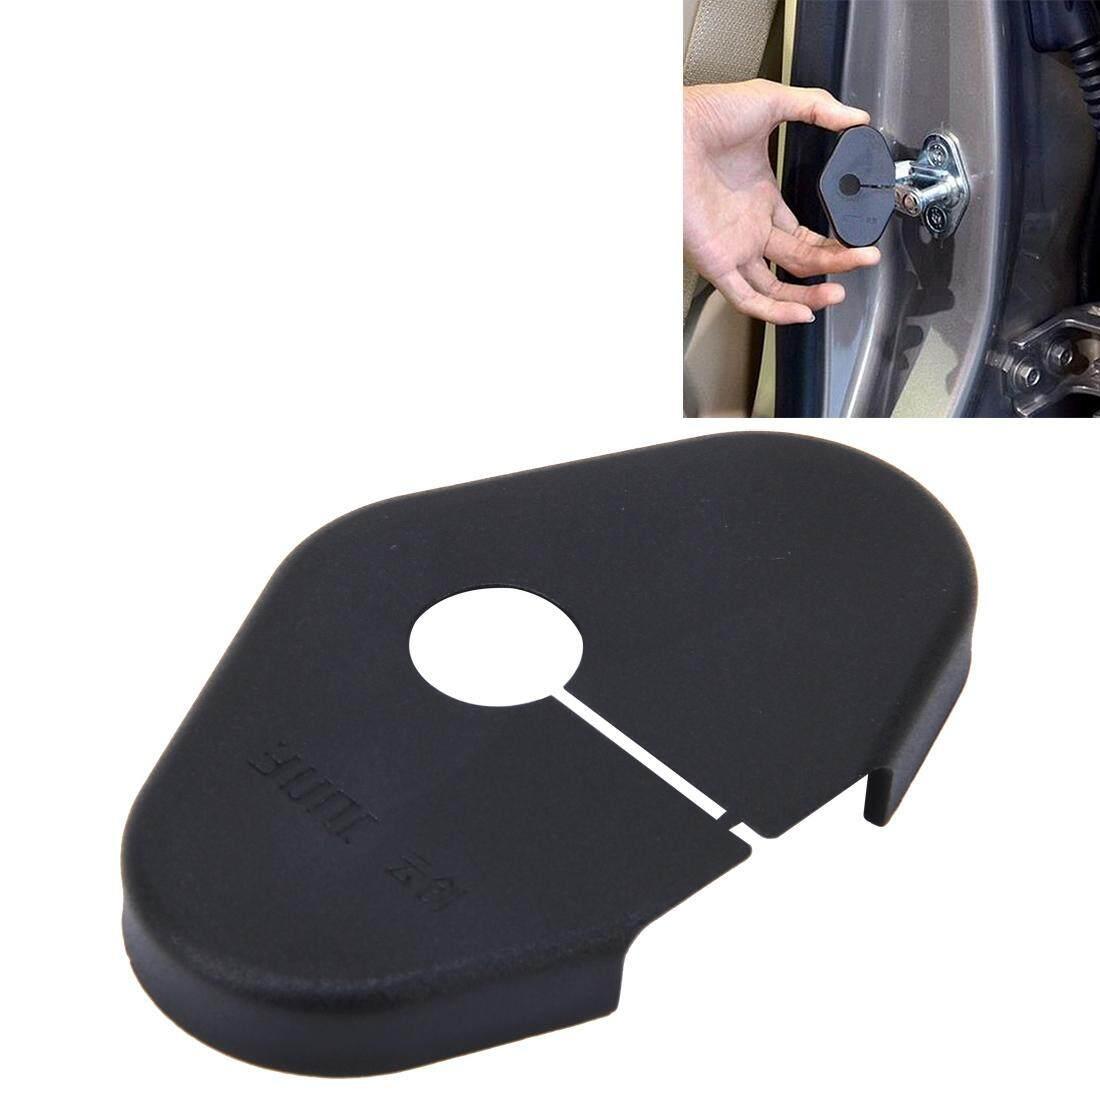 4 Pcs Mobil Pintu Mengunci Gesper Dihiasi Karat Menjaga Perlindungan Sarung Untuk Chevrolet MALIBU Aveo Cruze Camaro Volt TRAX- internasional